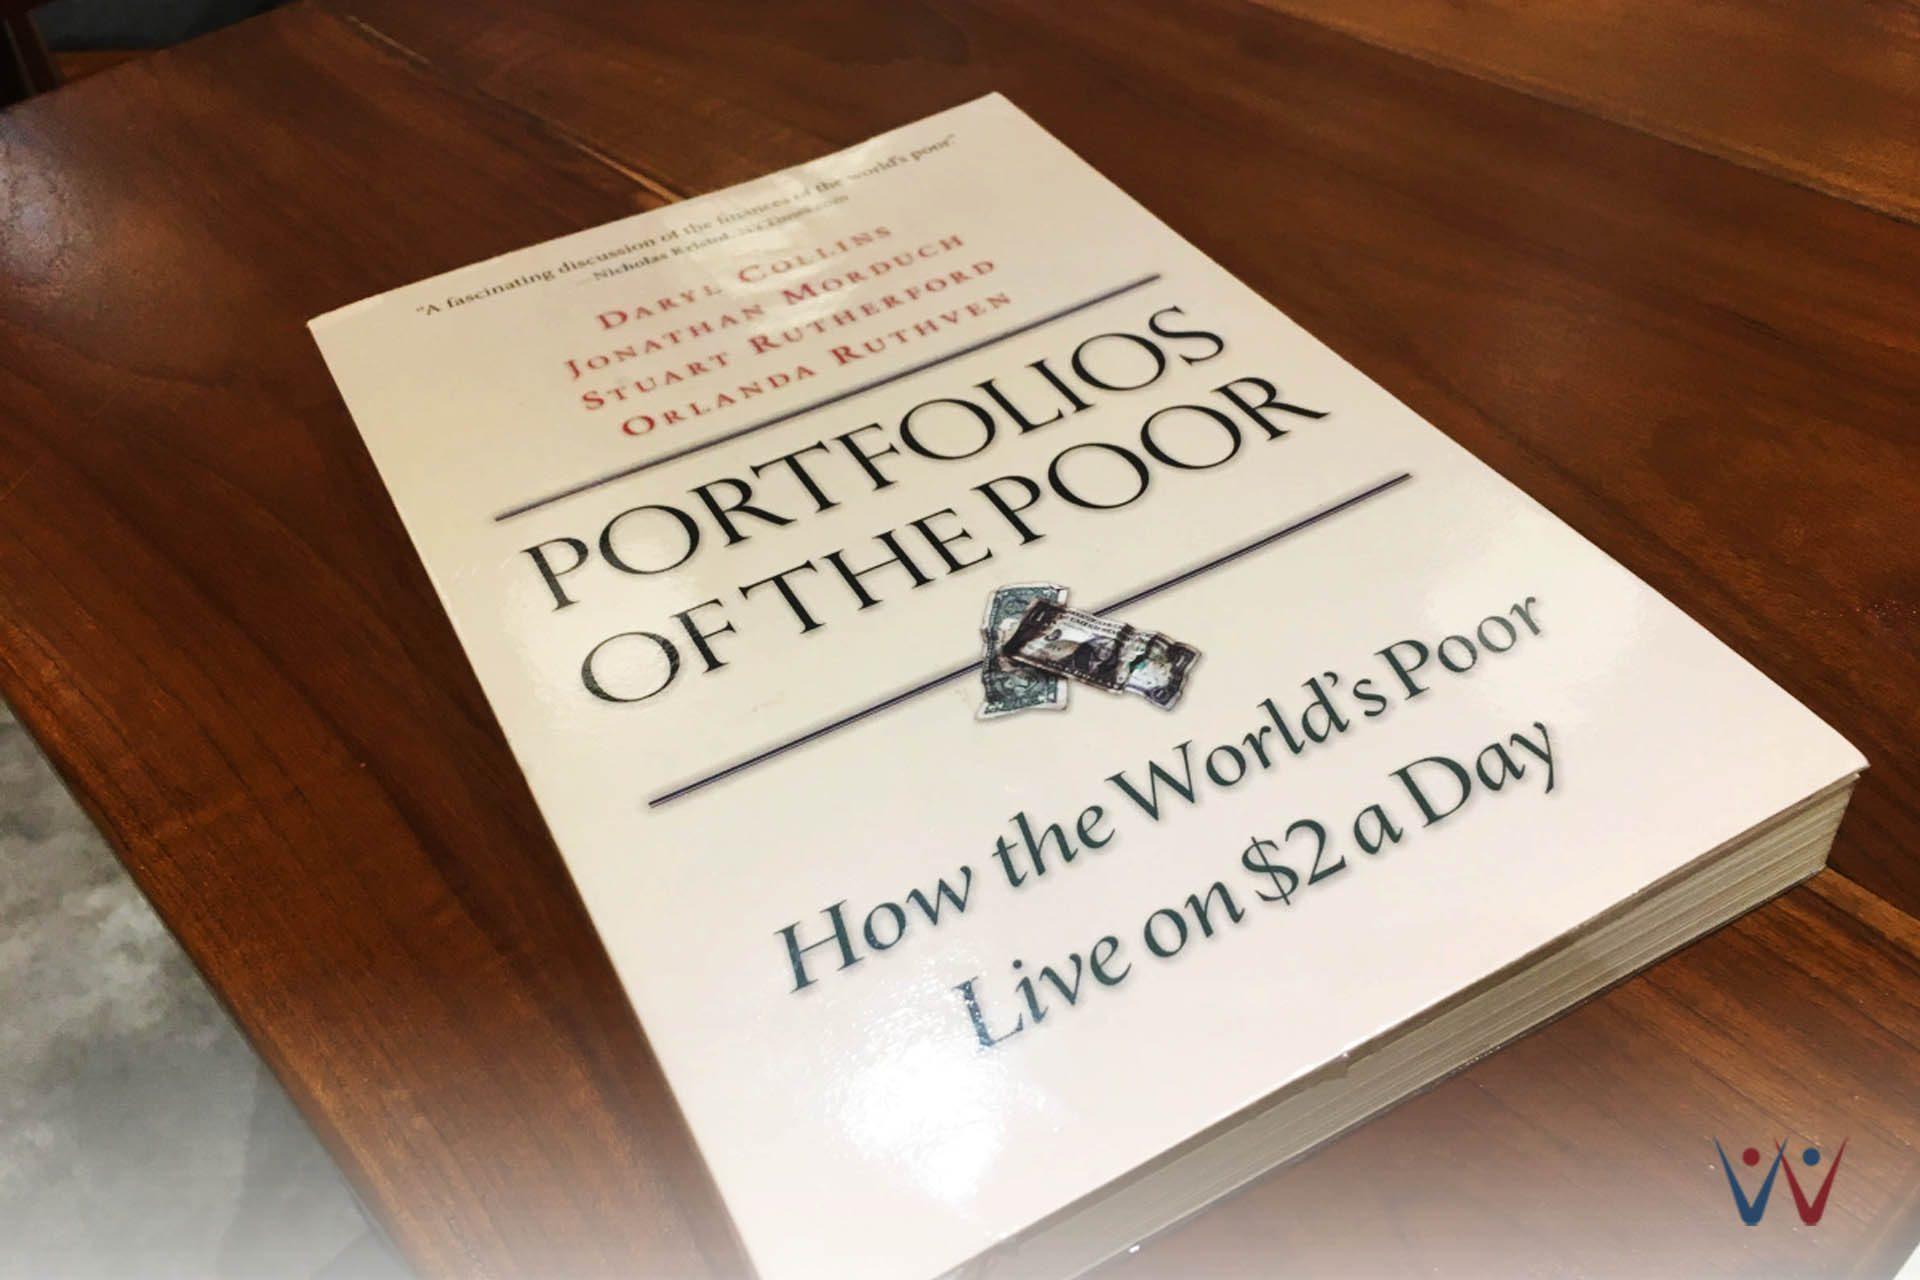 buku favorit orang sukses - mark zuckerberg - portofolios of the poor